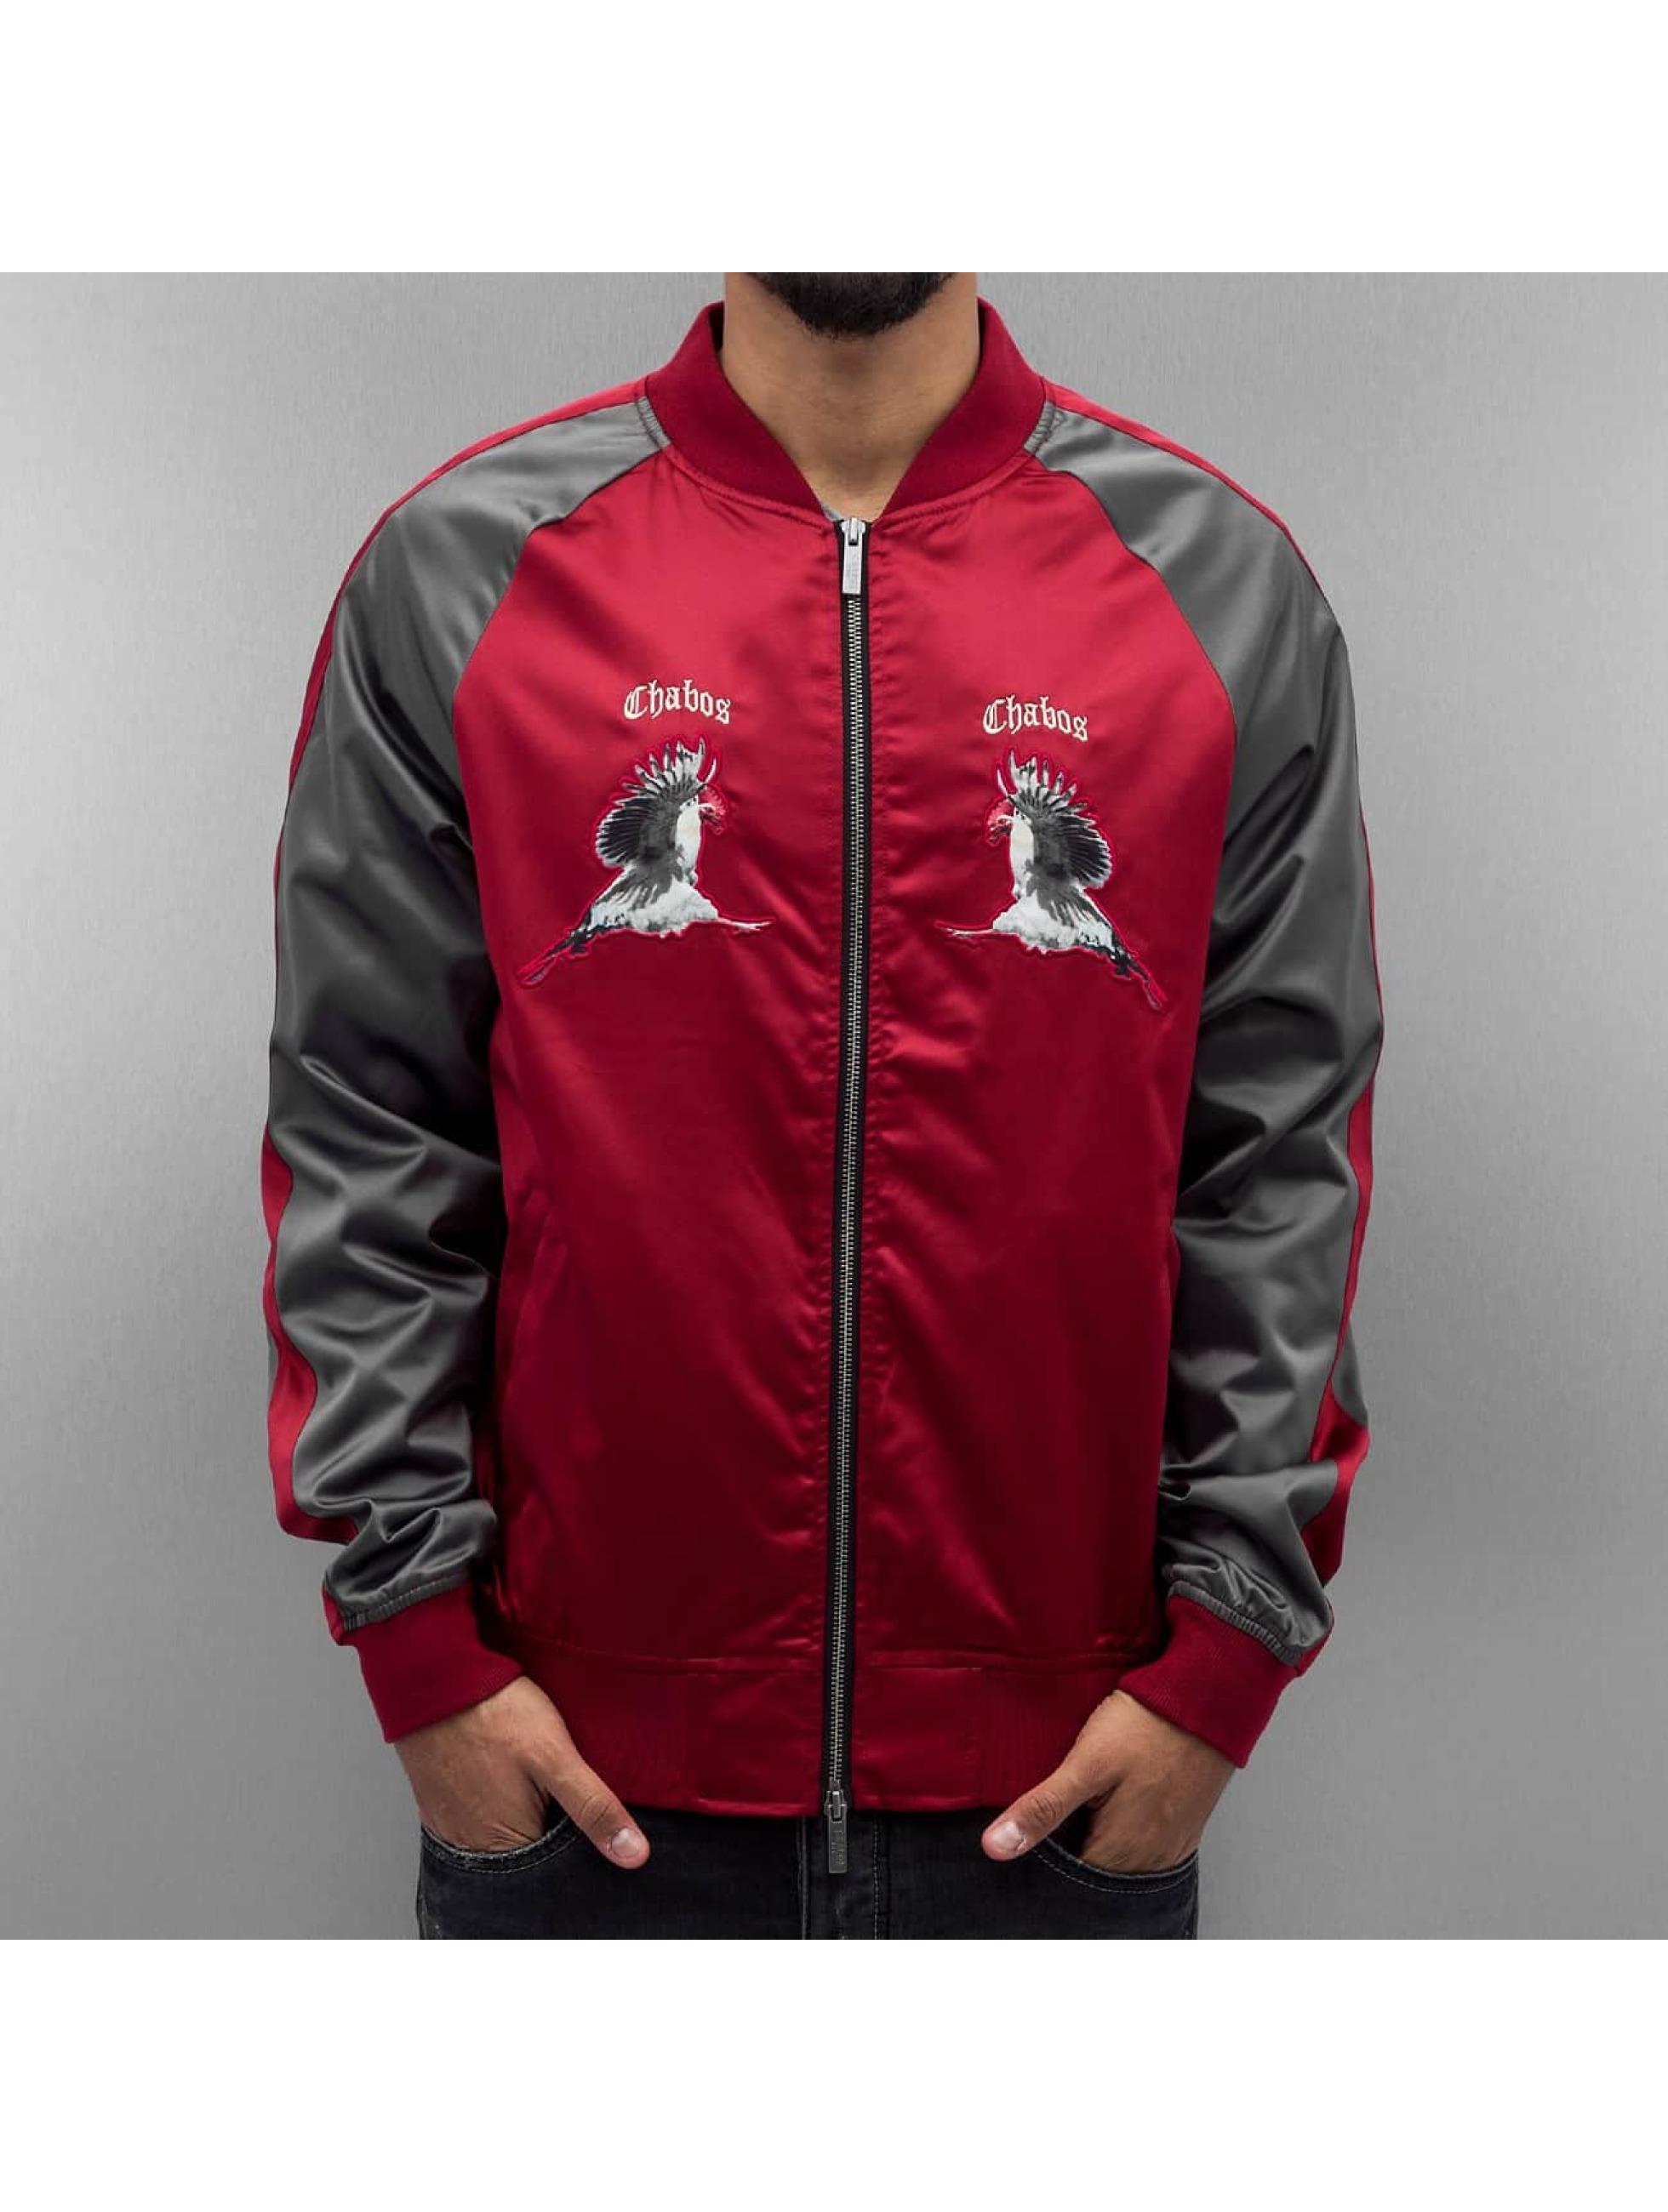 CHABOS IIVII Lightweight Jacket Kick Push Souvenir gray